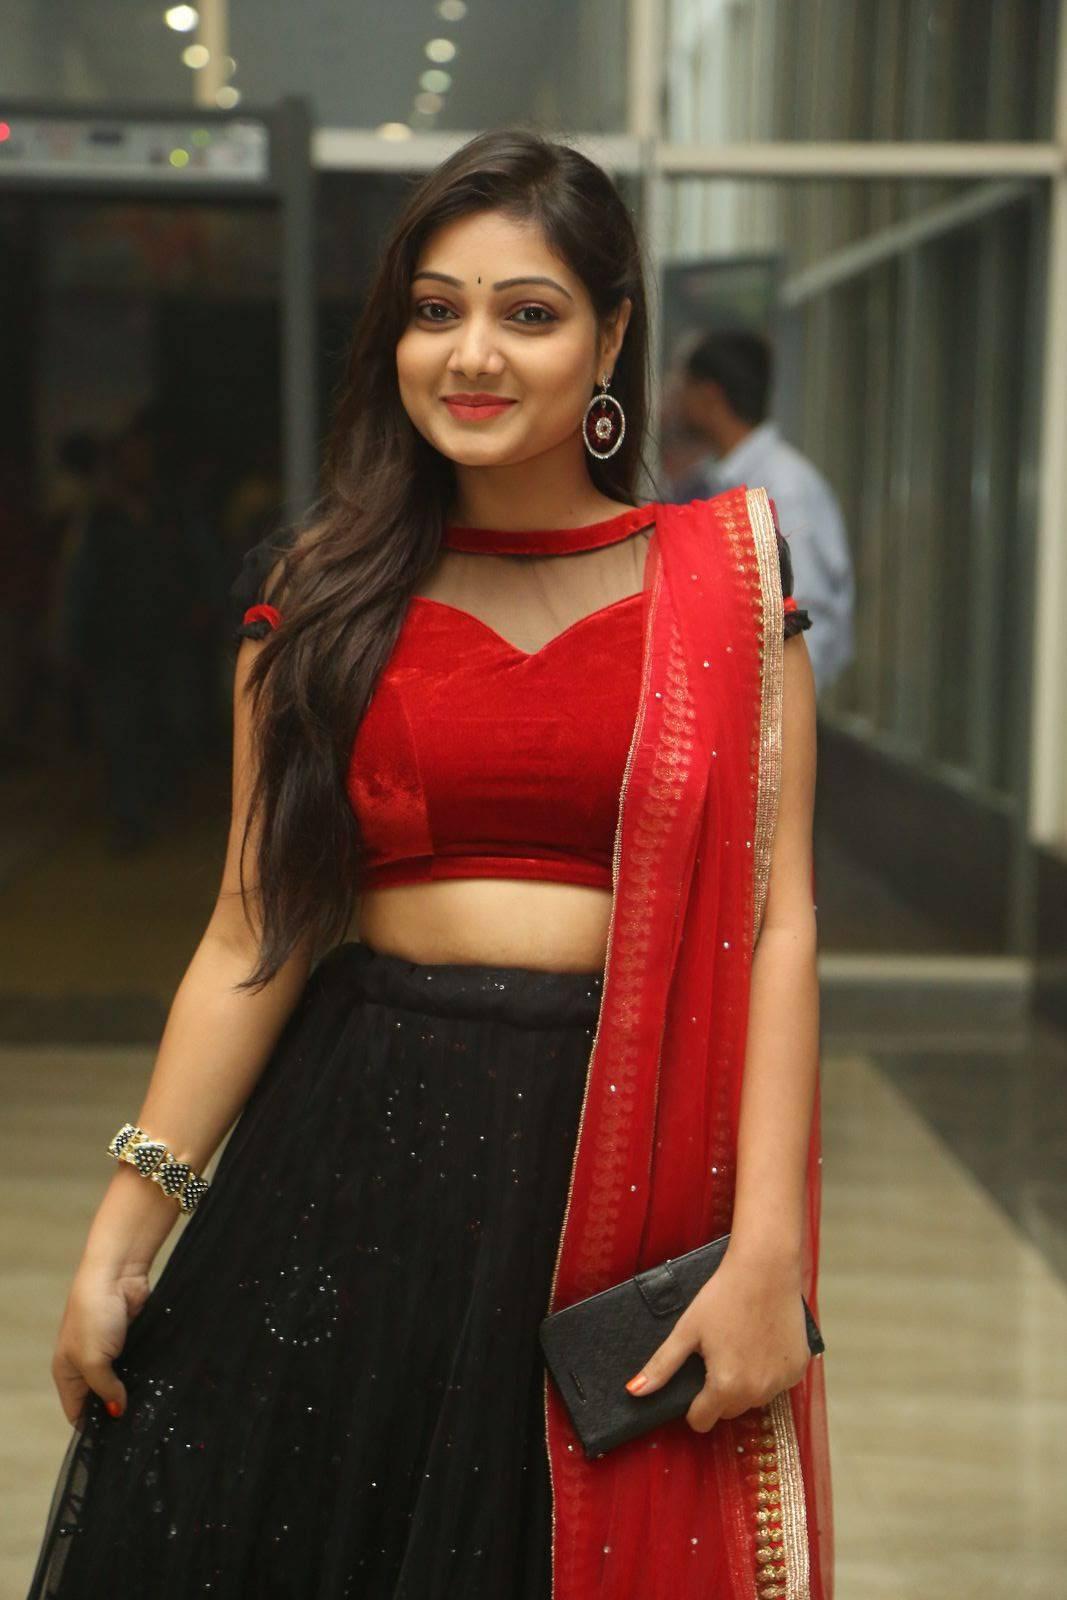 Telugu Tv Girl Priyanka Navel Show At Movie Trailer Launch -2486